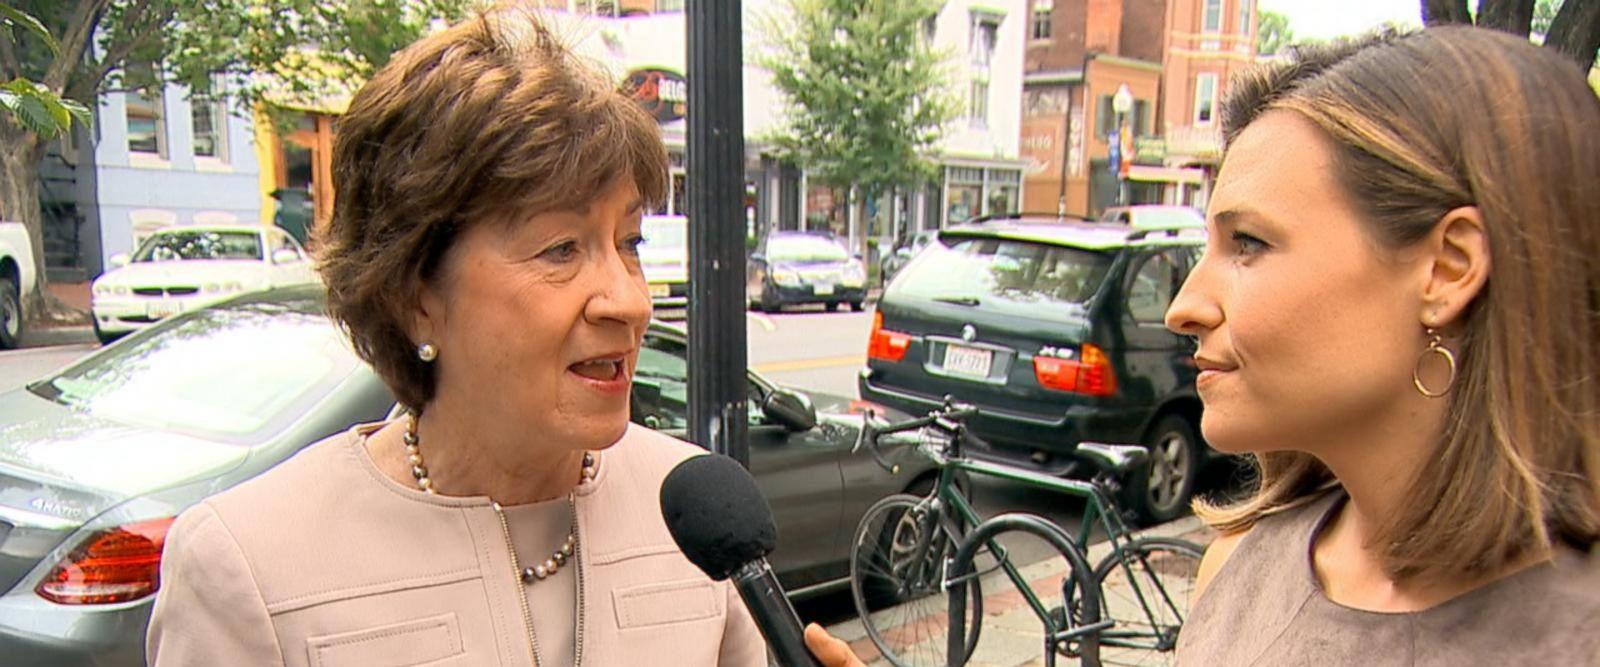 VIDEO: Sen. Collins talks skepticism about latest GOP health care proposal